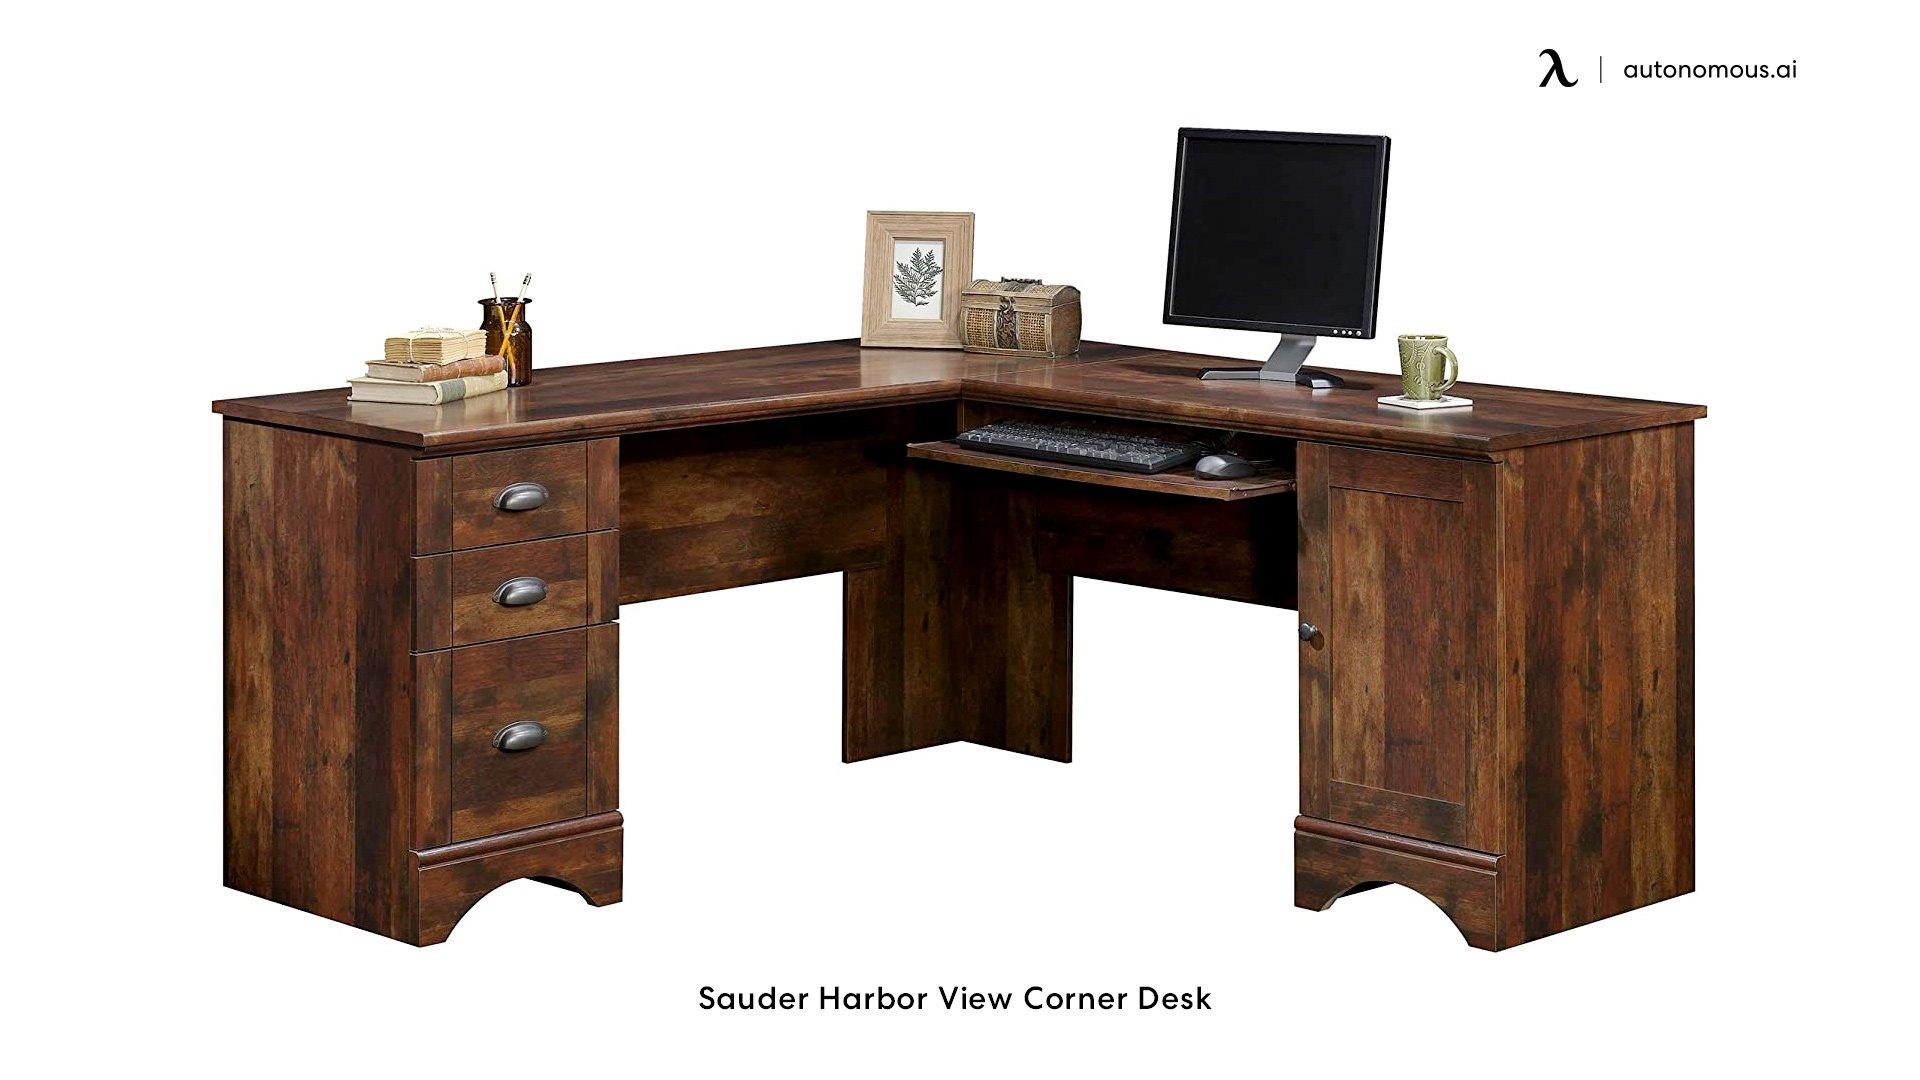 Sauder Harbor View Corner Desk